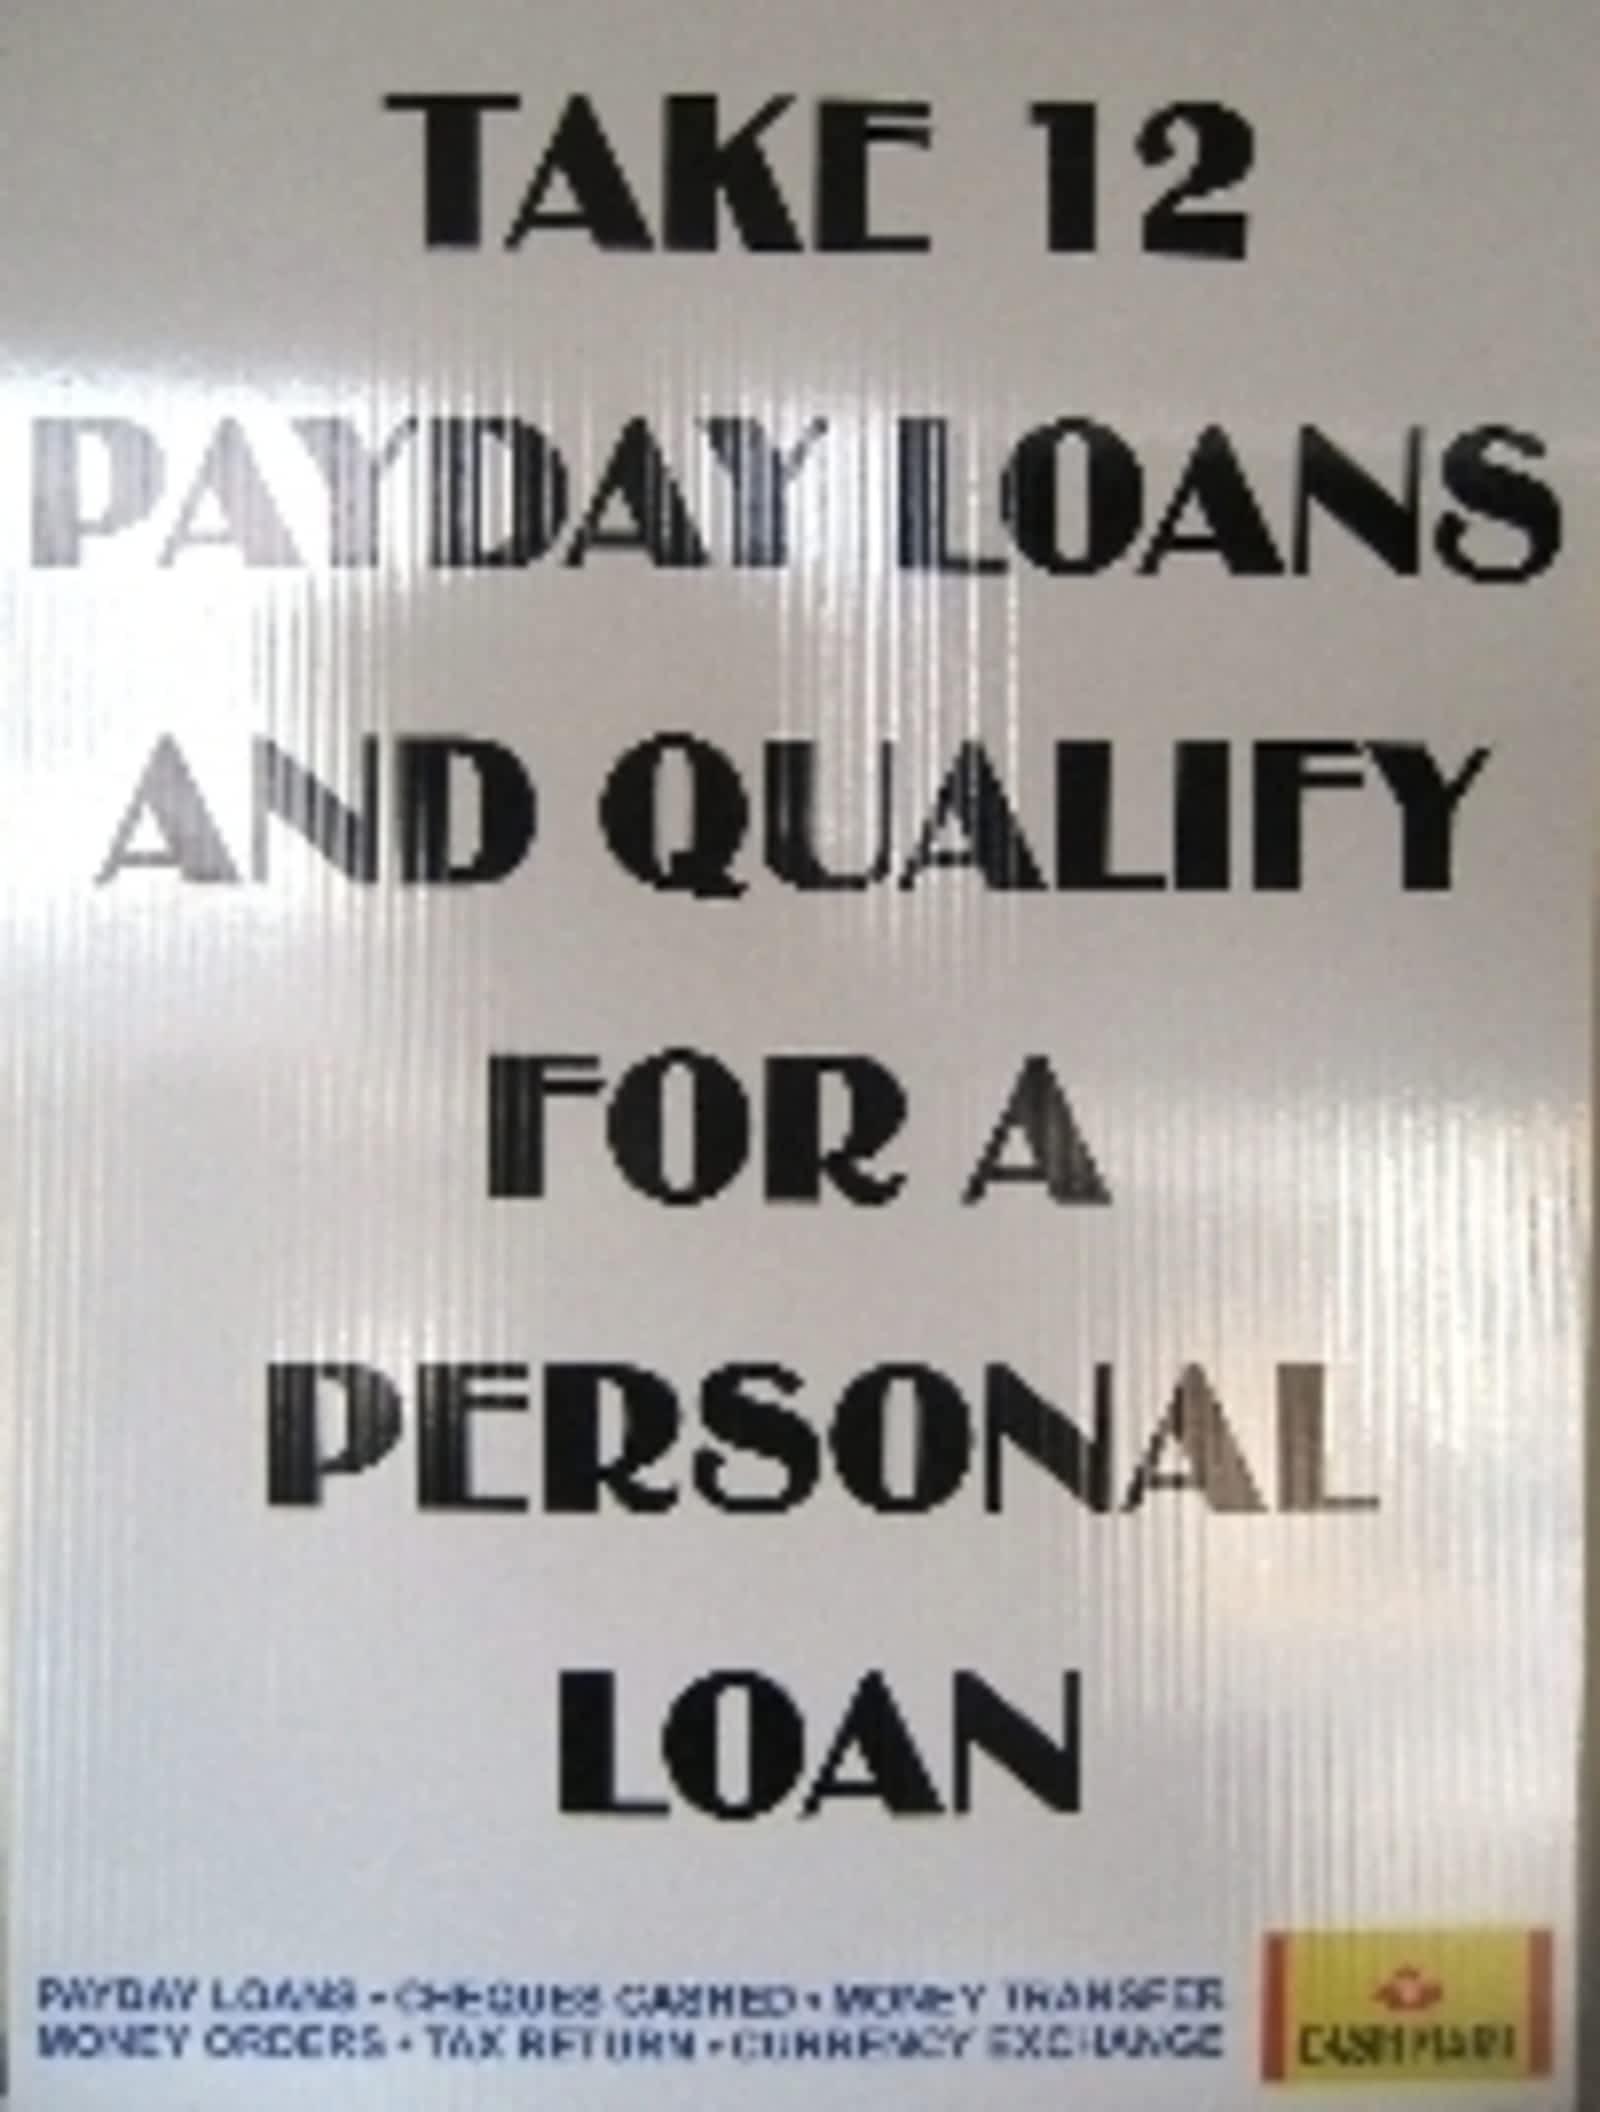 Get instant cash loan photo 5